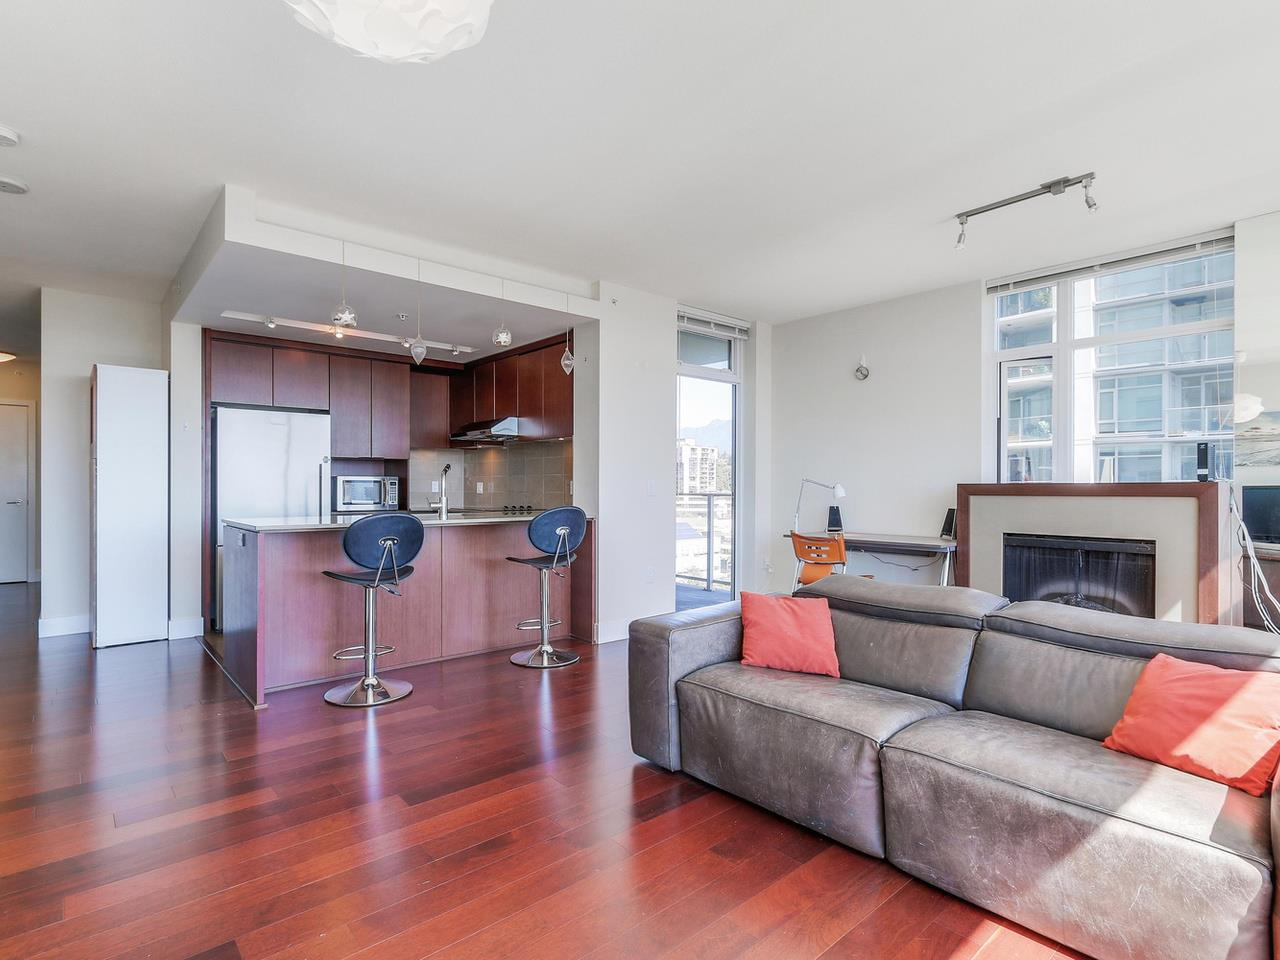 Condo Apartment at 1201 1320 CHESTERFIELD AVENUE, Unit 1201, North Vancouver, British Columbia. Image 10